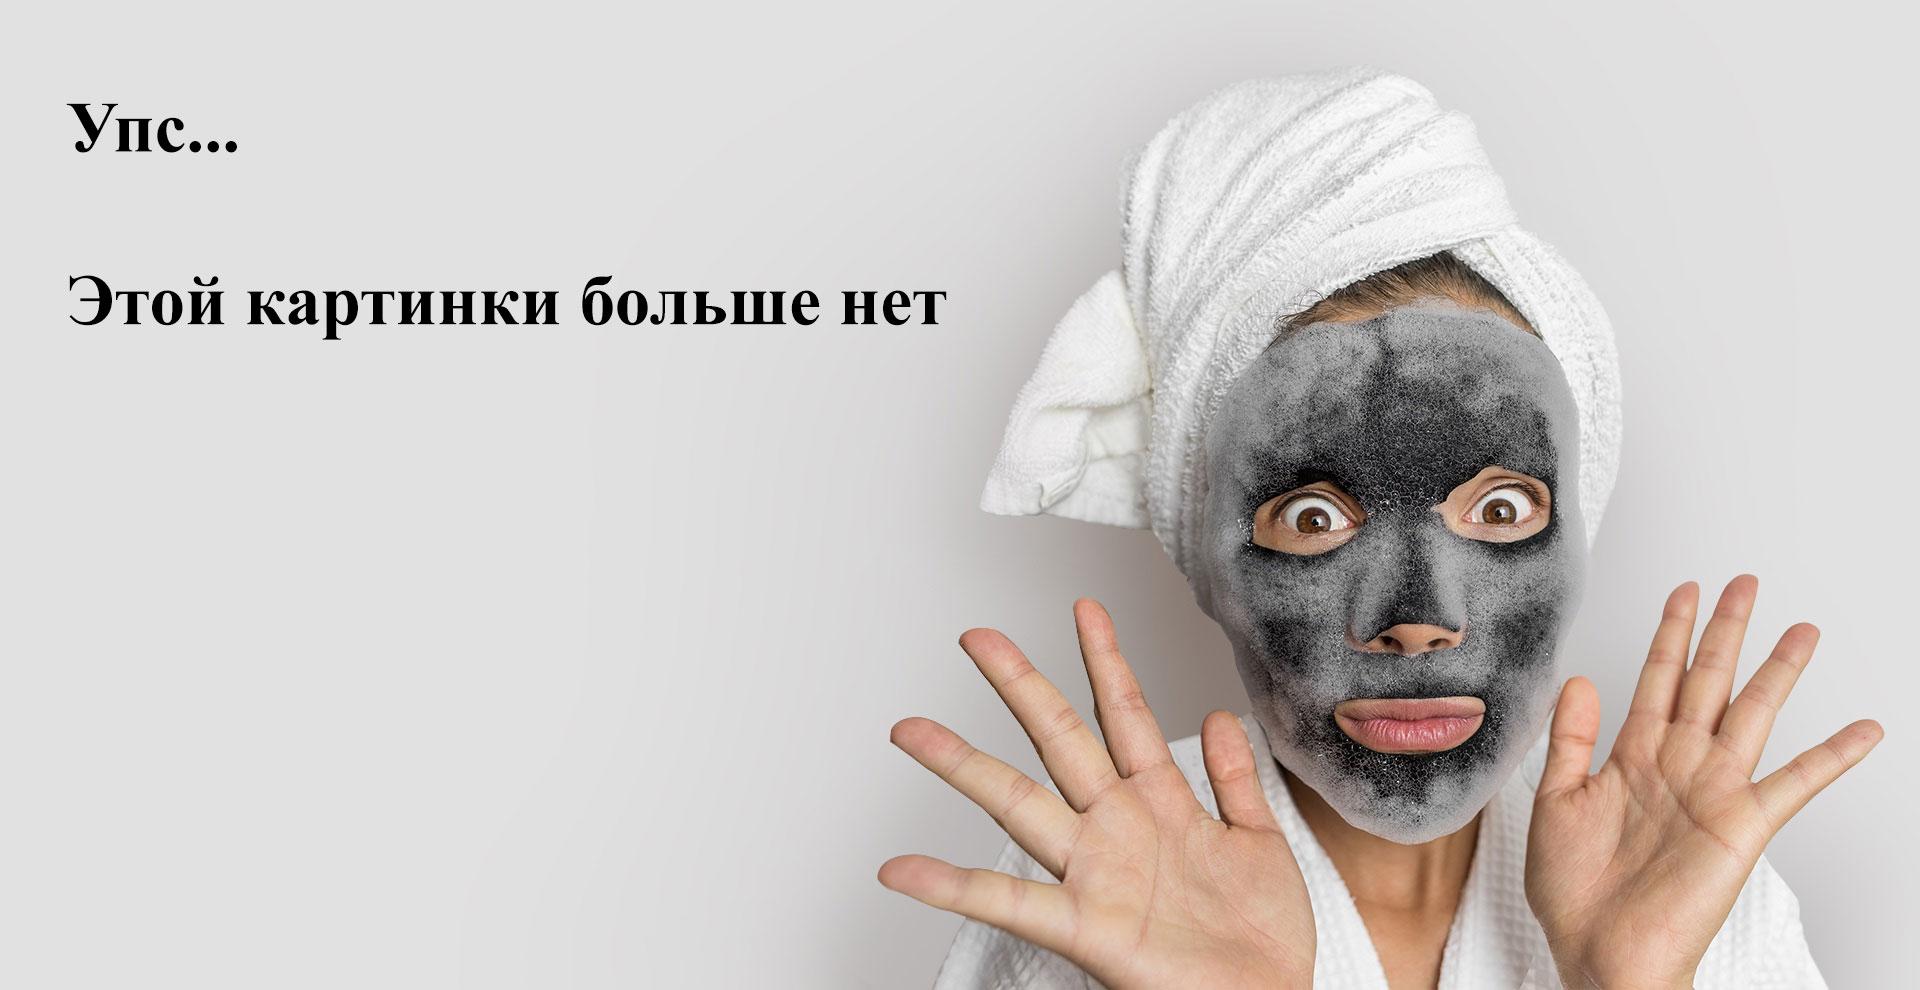 Patrisa Nail, Гель-лак «Про любовь» №402, Джентльмен